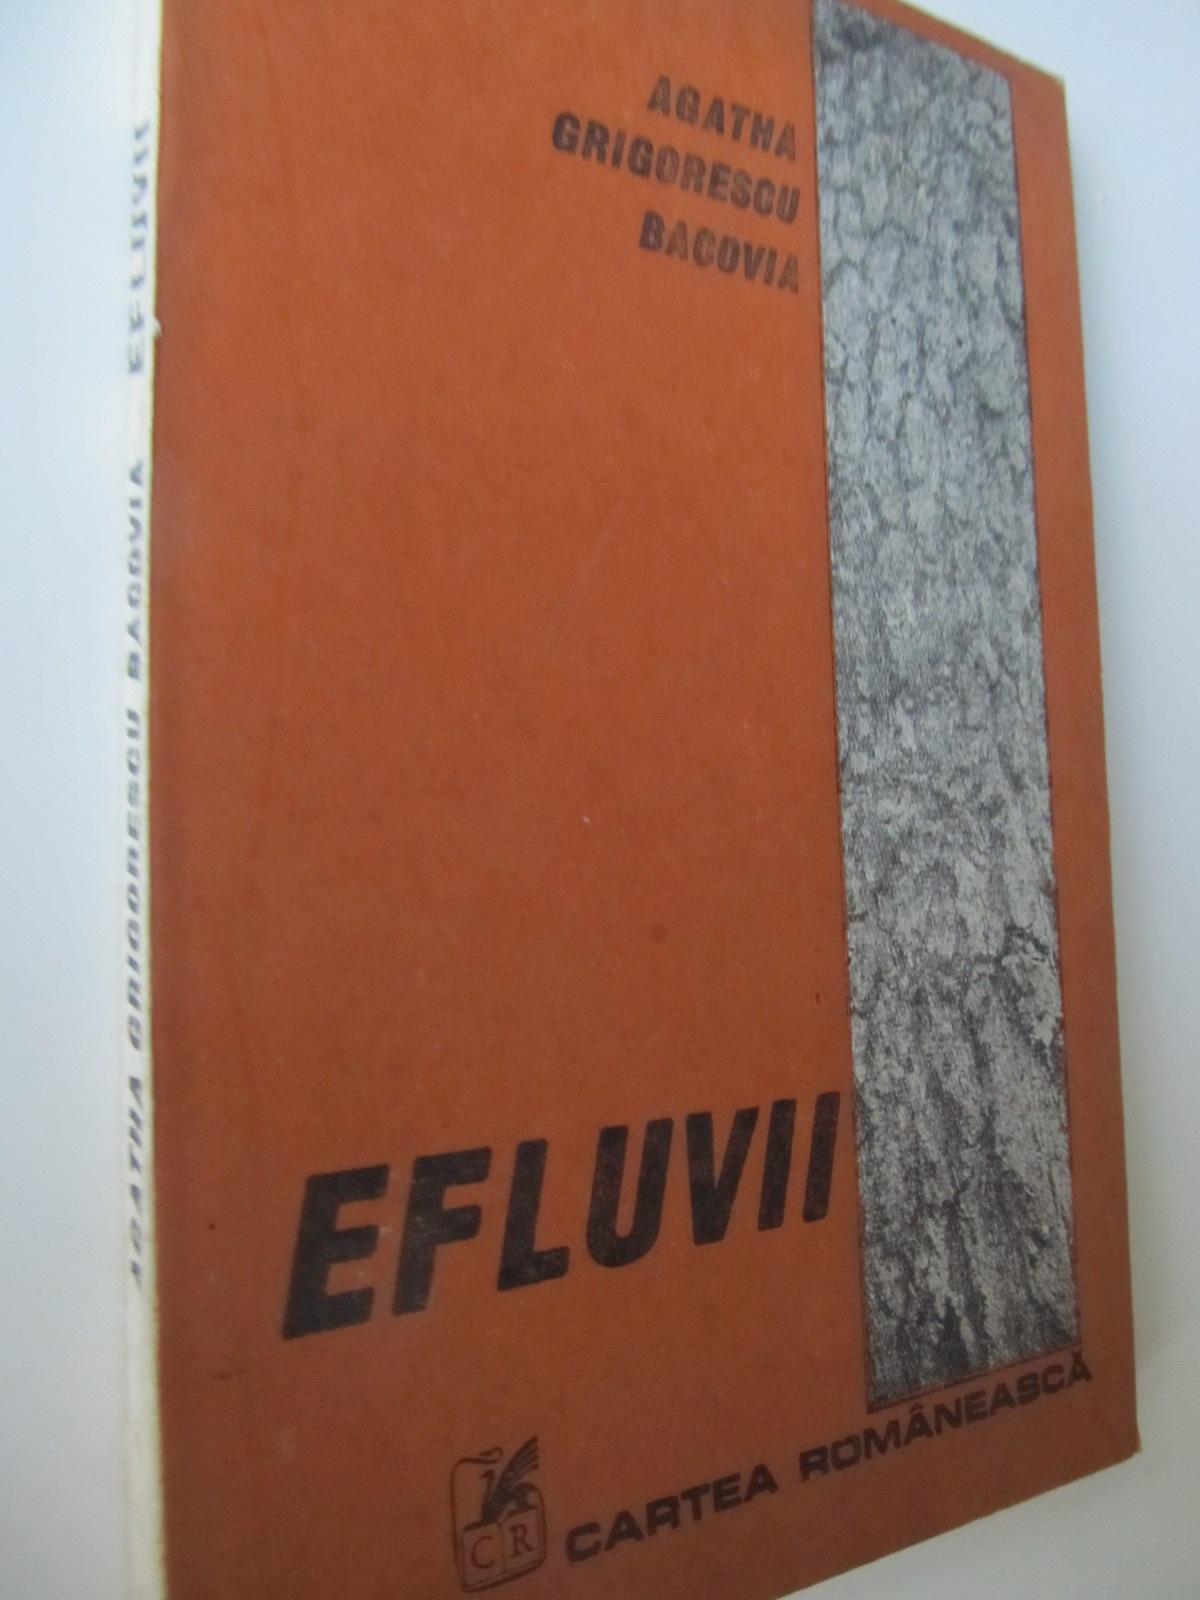 Efluvii - Agatha Grigorescu Bacovia | Detalii carte